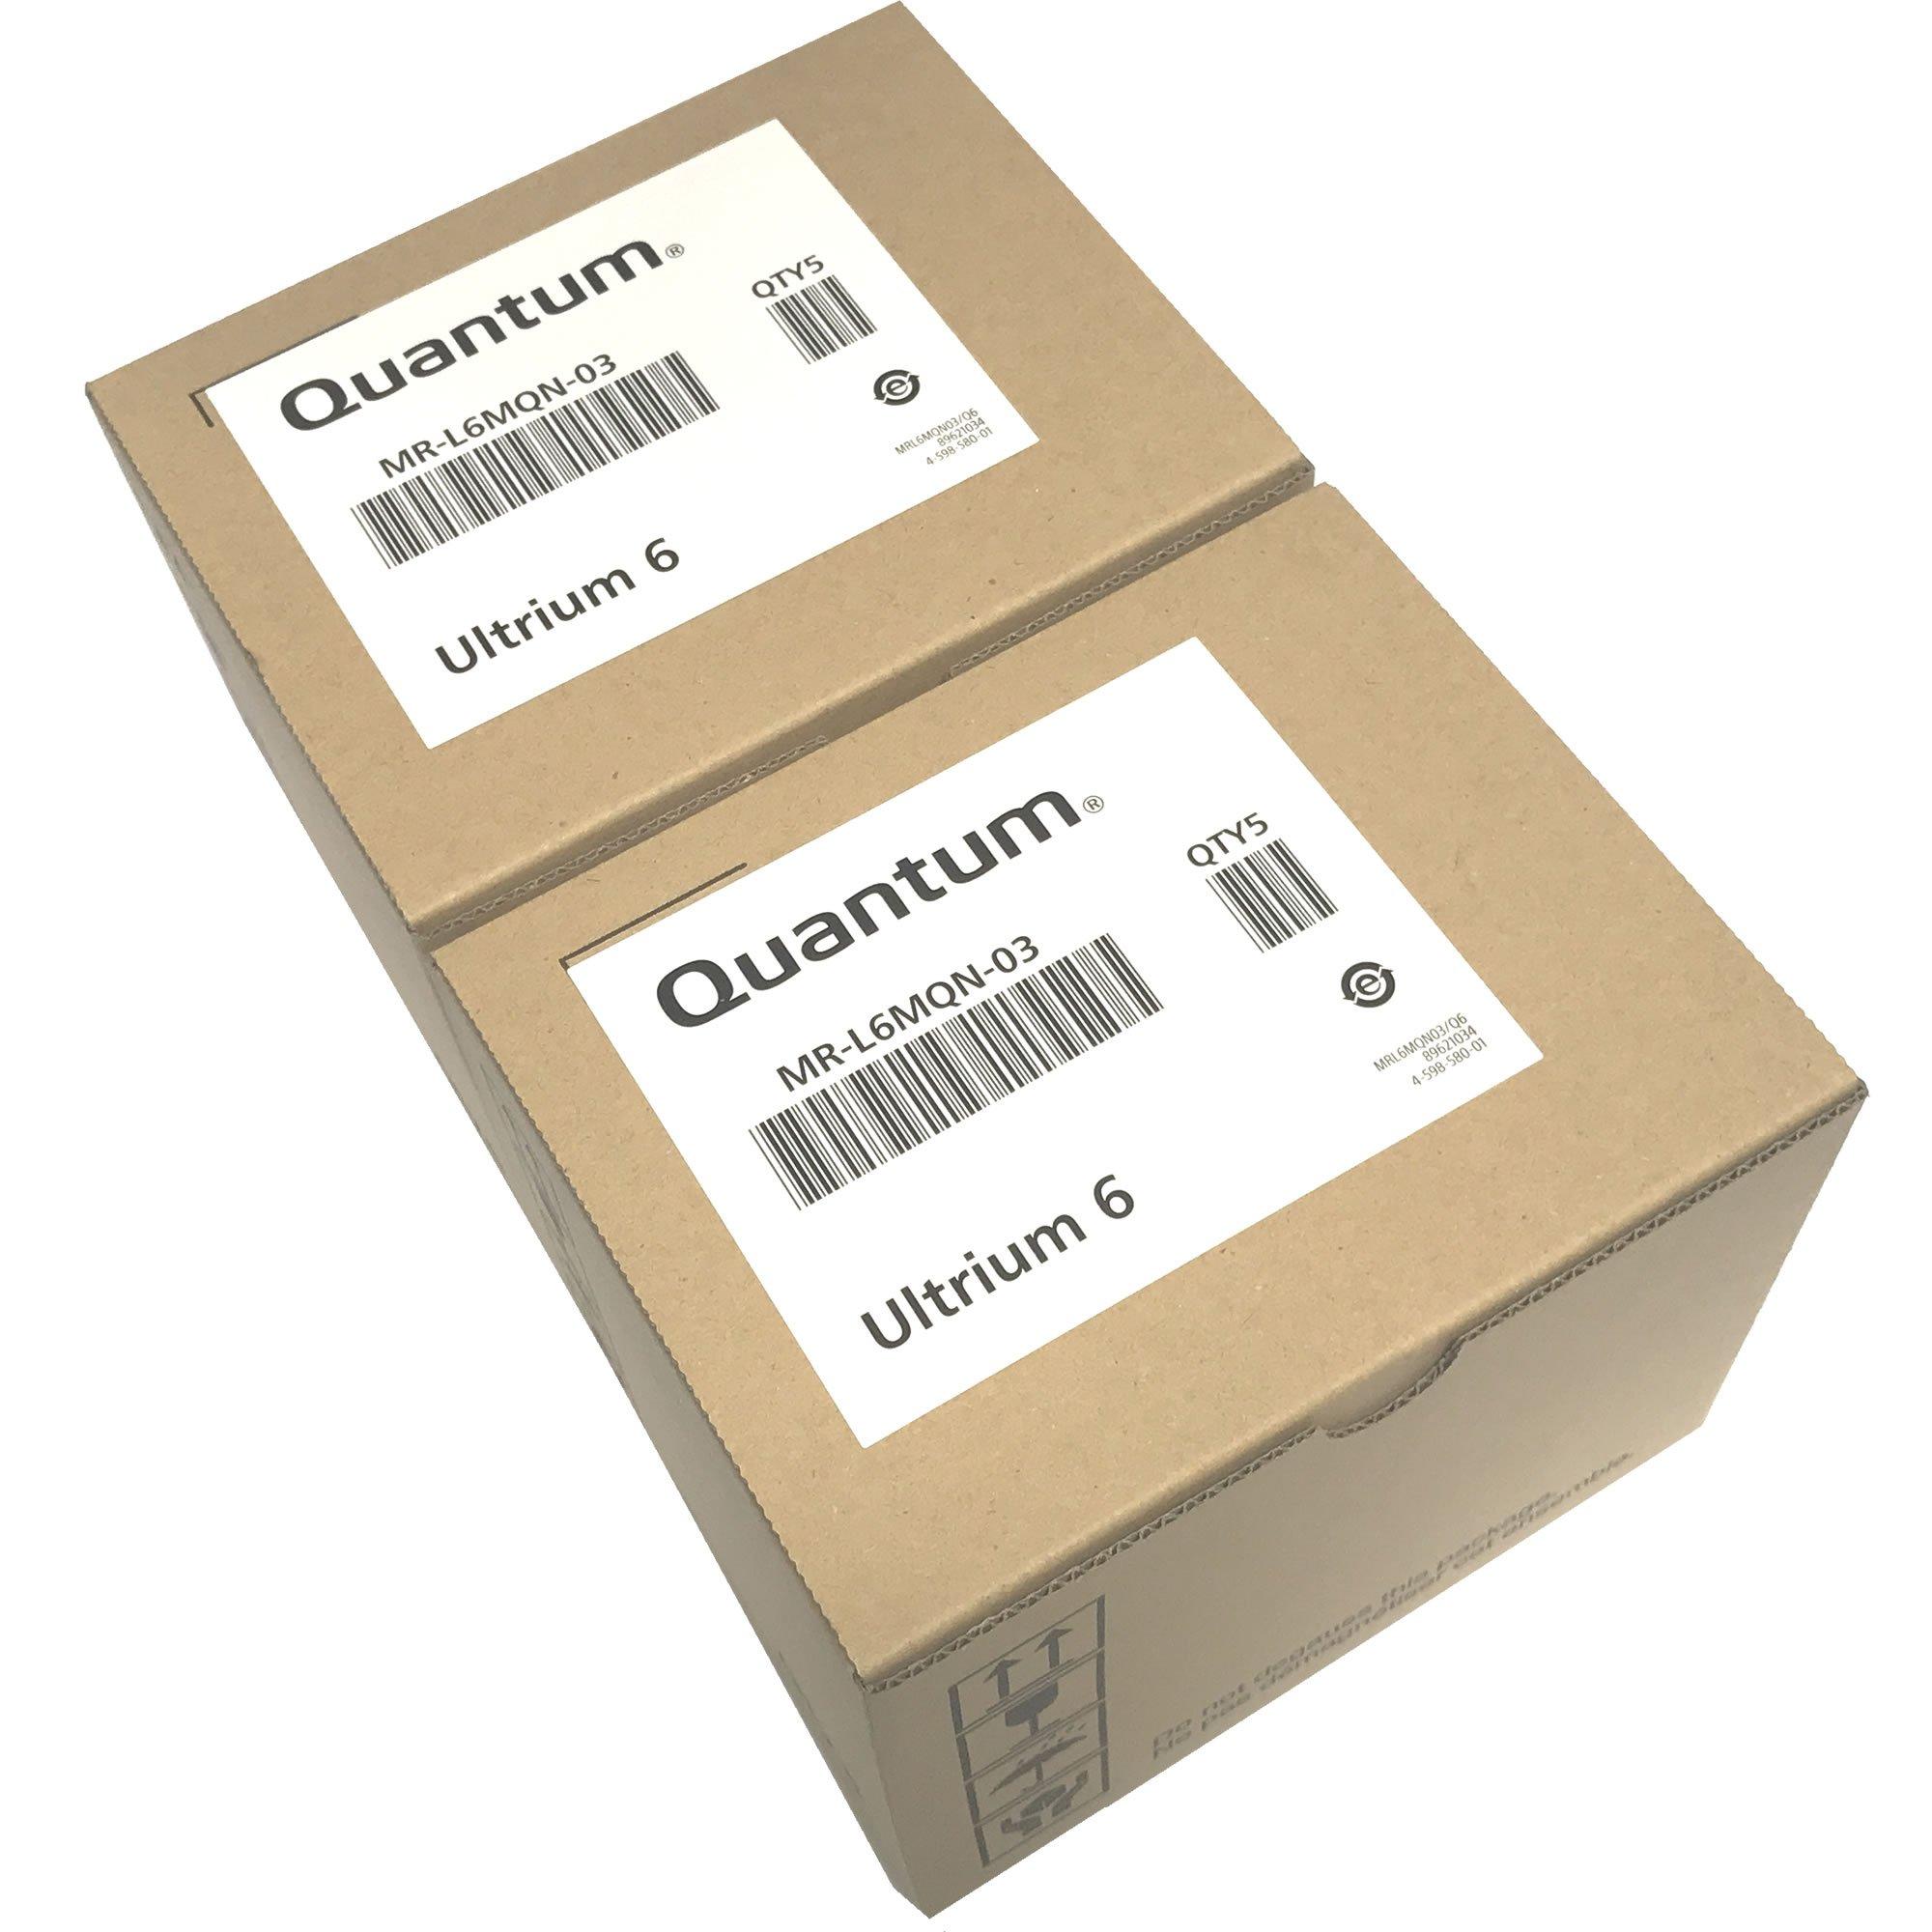 10-Pack Quantum MR-L6MQN-03 LTO 6 Ultrium (2.5/6.25 TB) Data Tape Cartridges